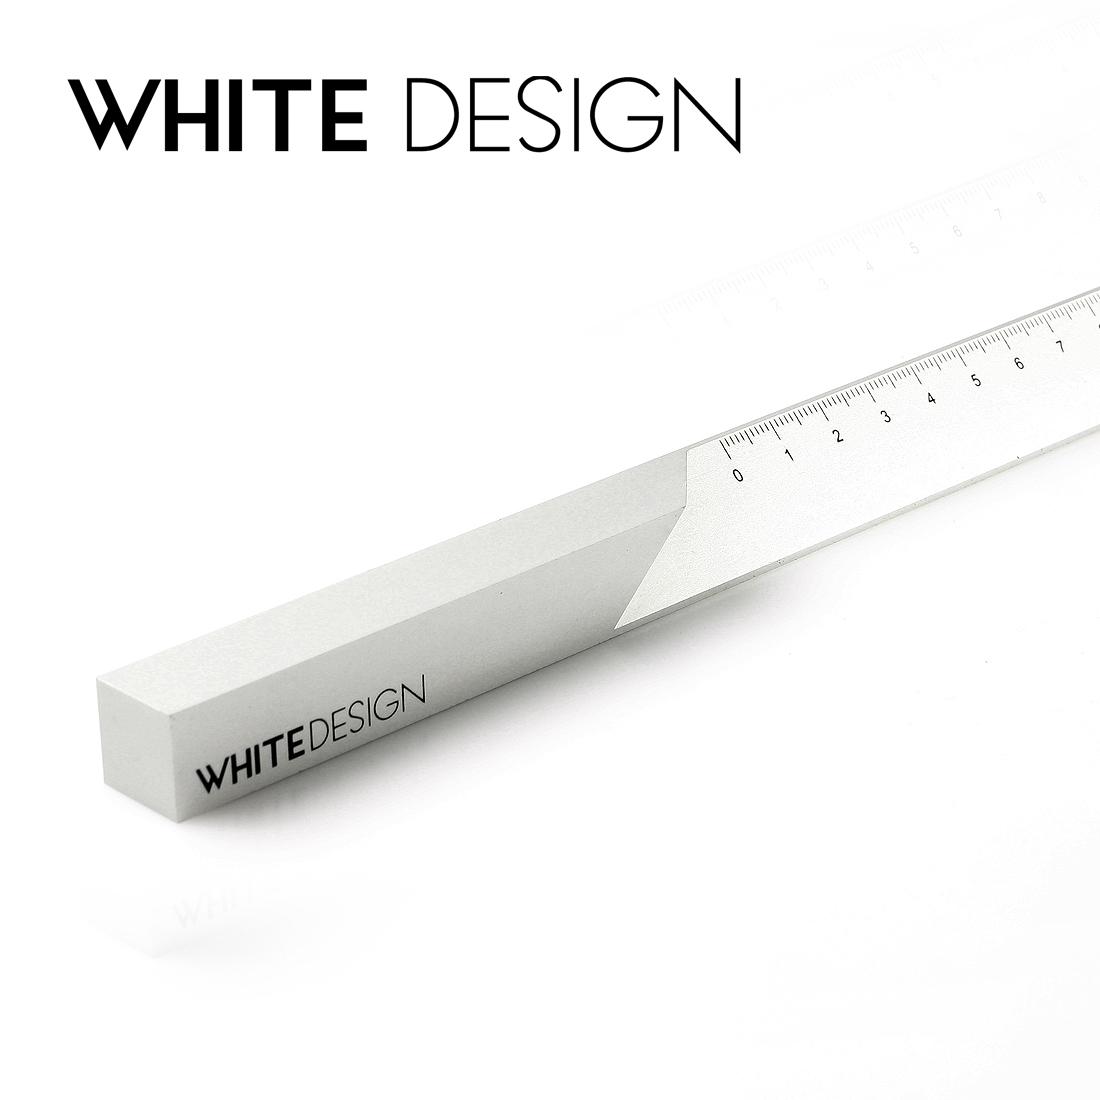 white design architectural ruler aluminum alloy creative office stationery designer metal ruler 15cm